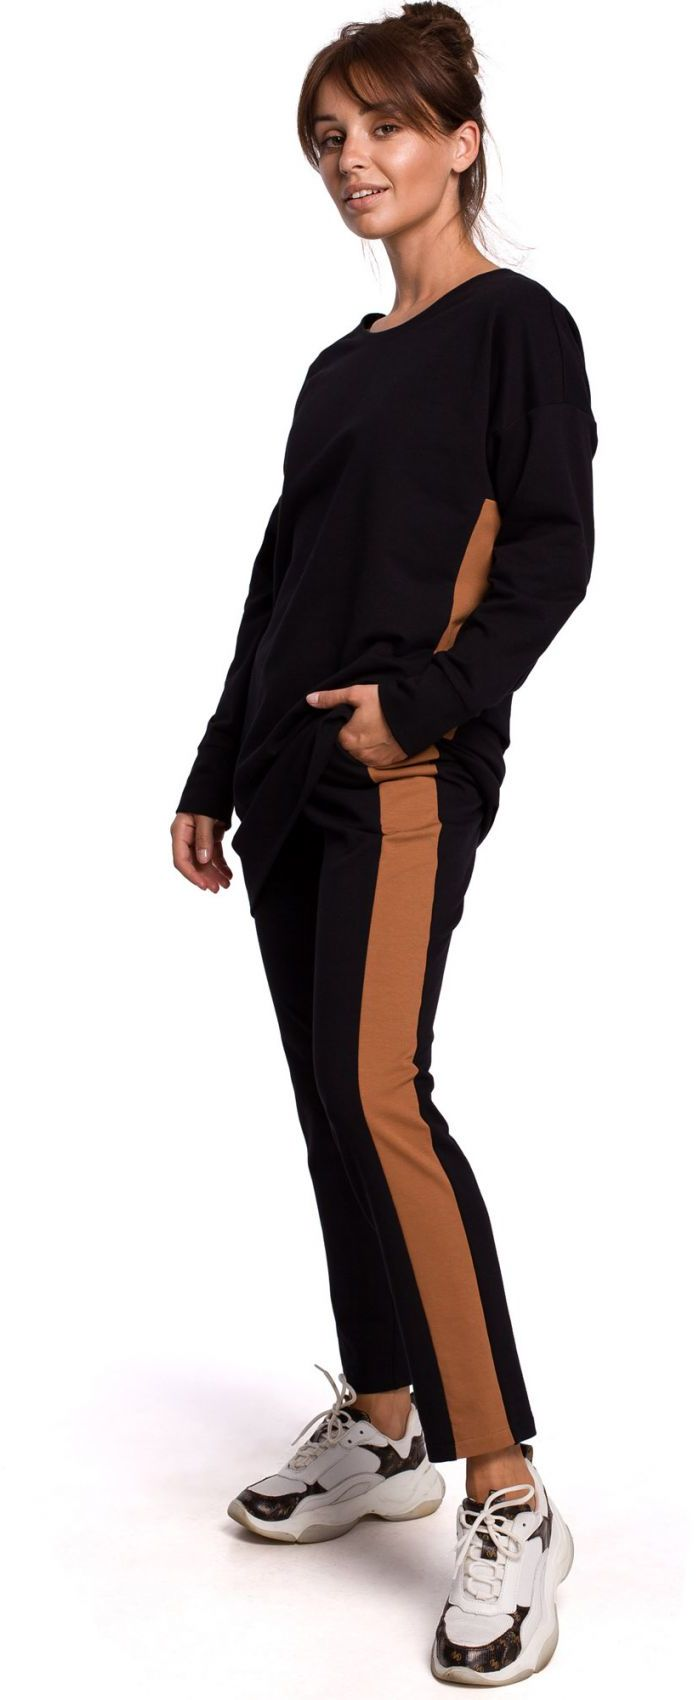 B173 Spodnie z lampasami - czarne